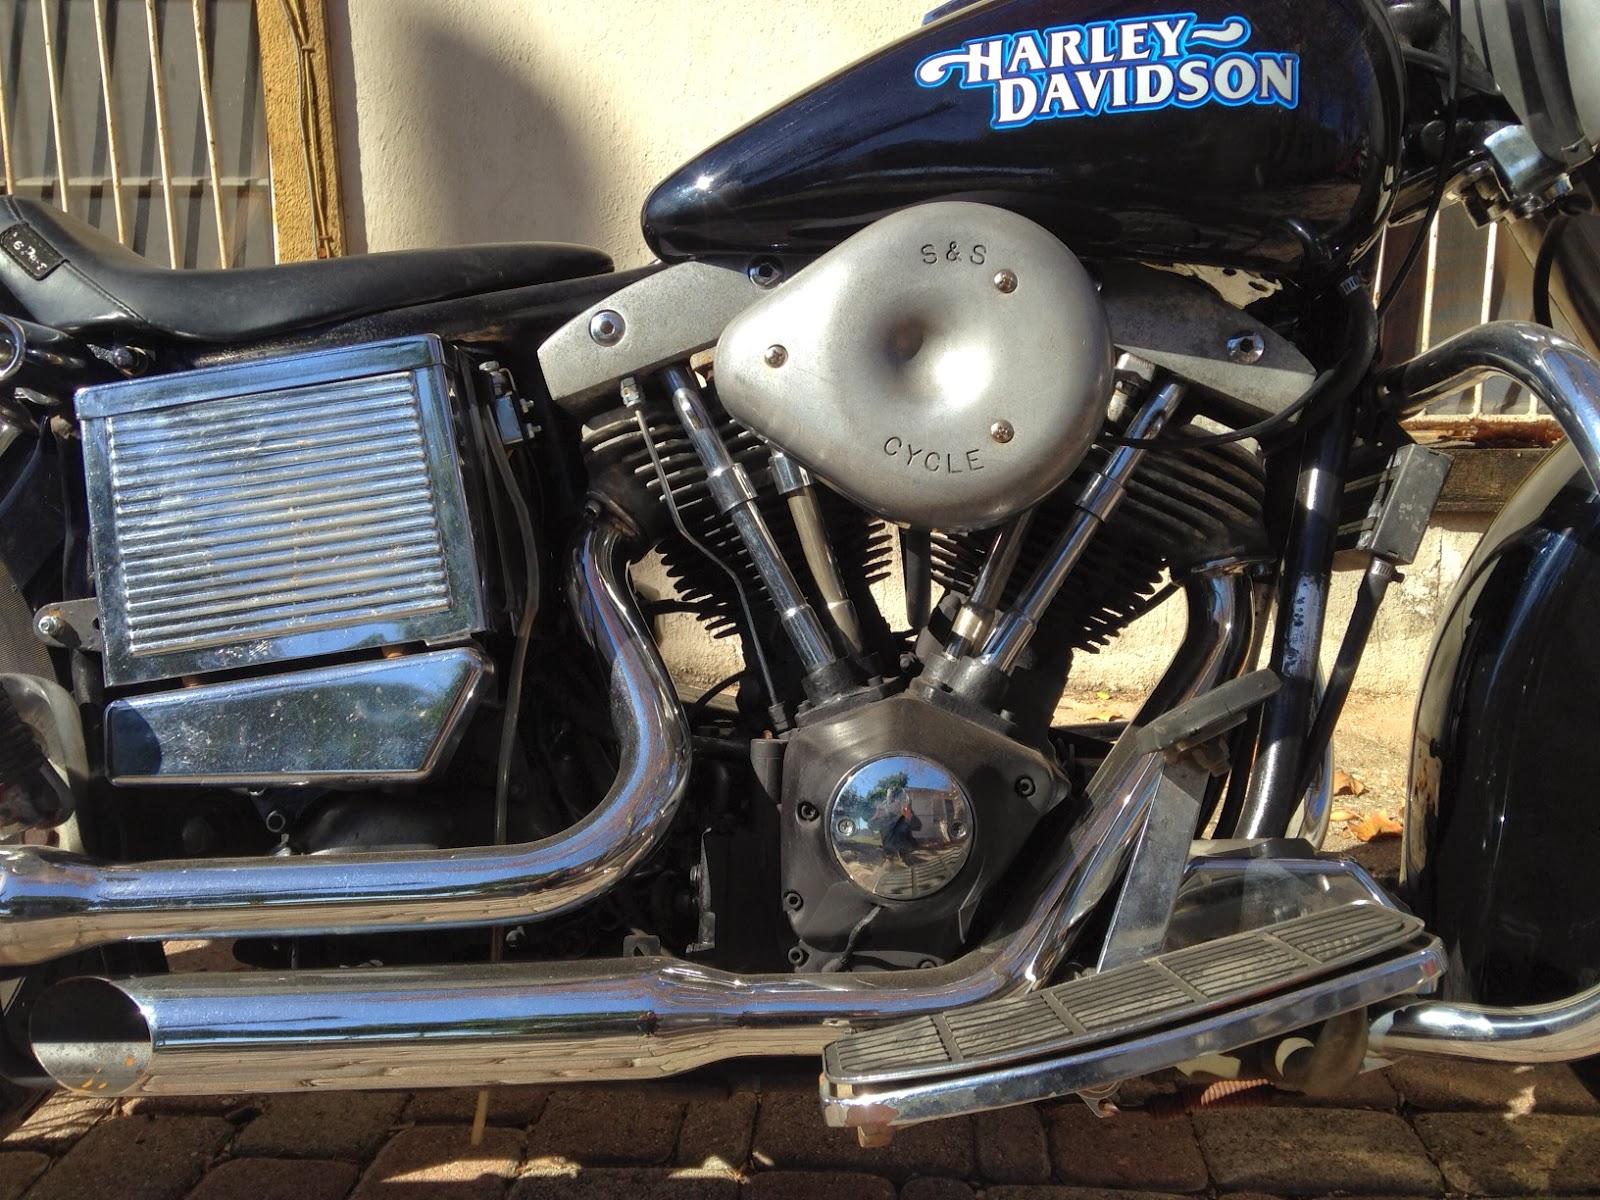 Bud's Motorcycles